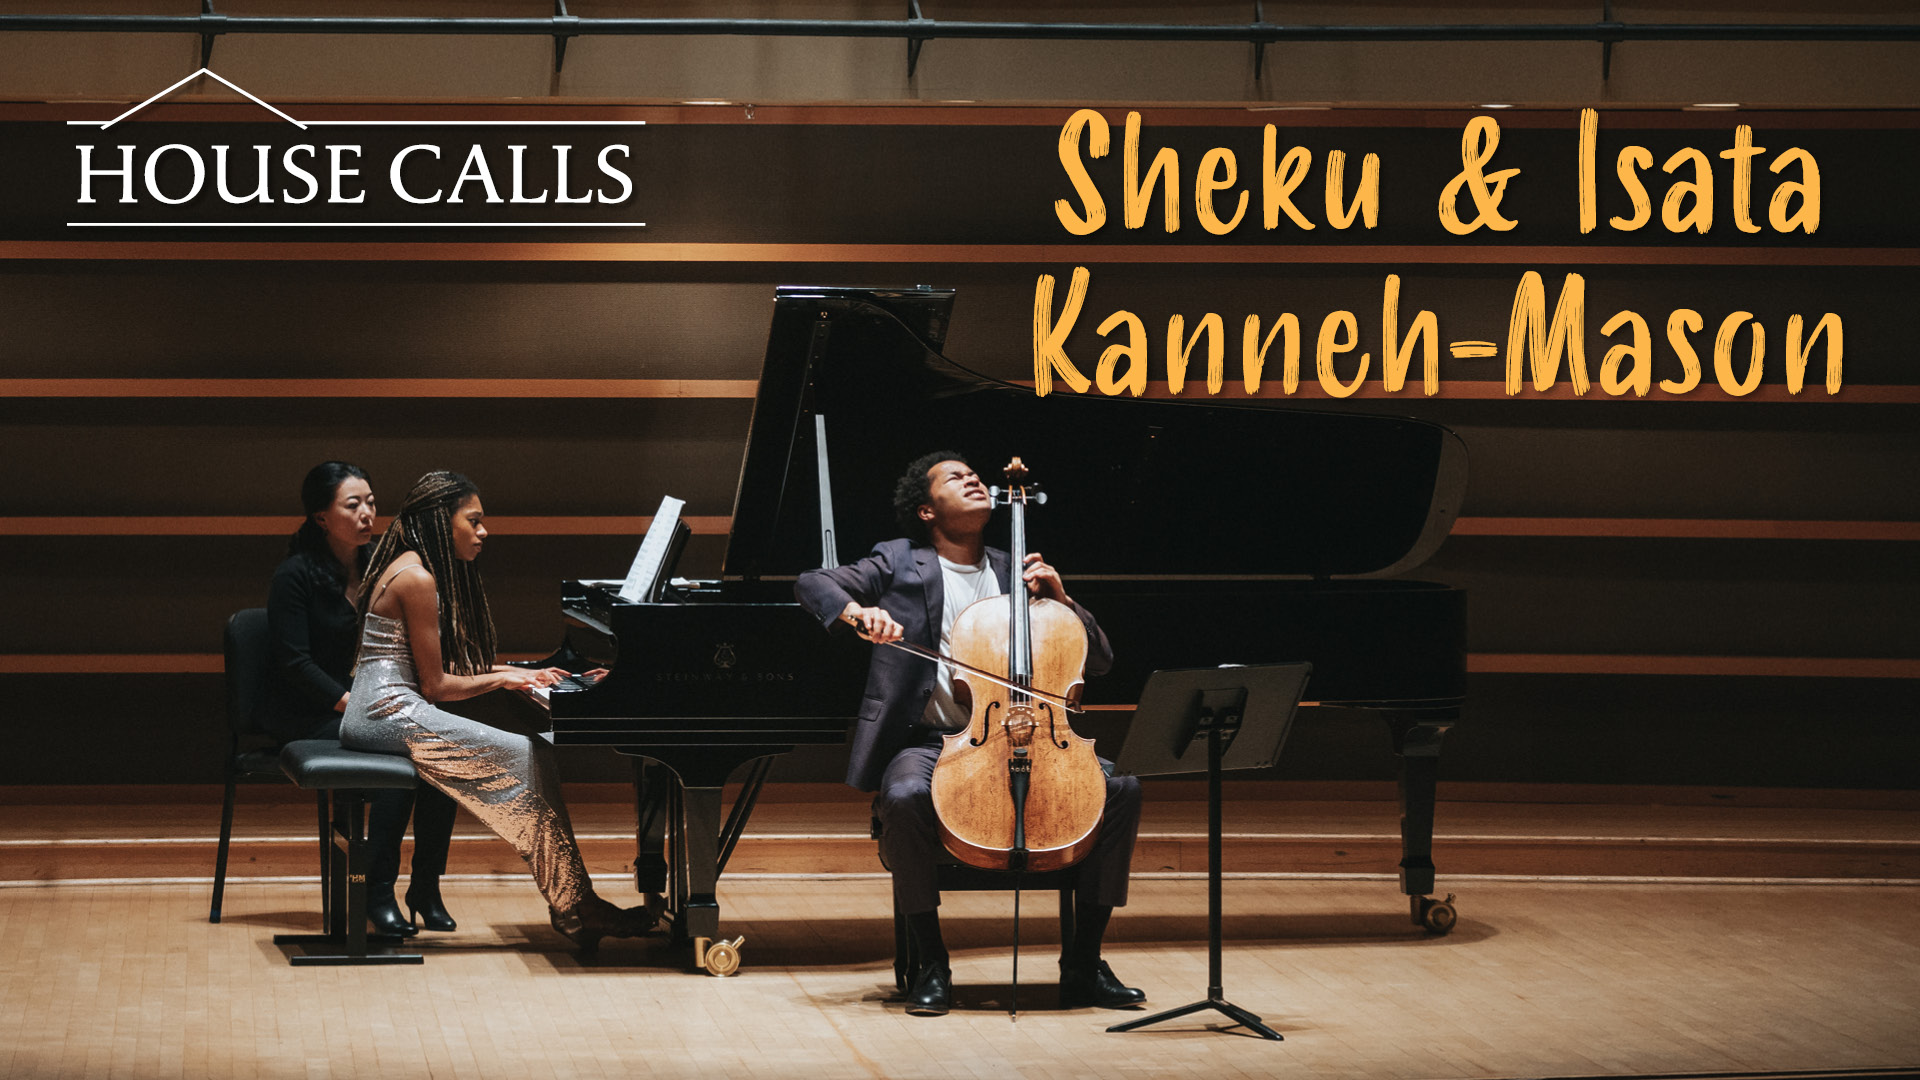 Image of Sheku and Isata Kanneh-Mason